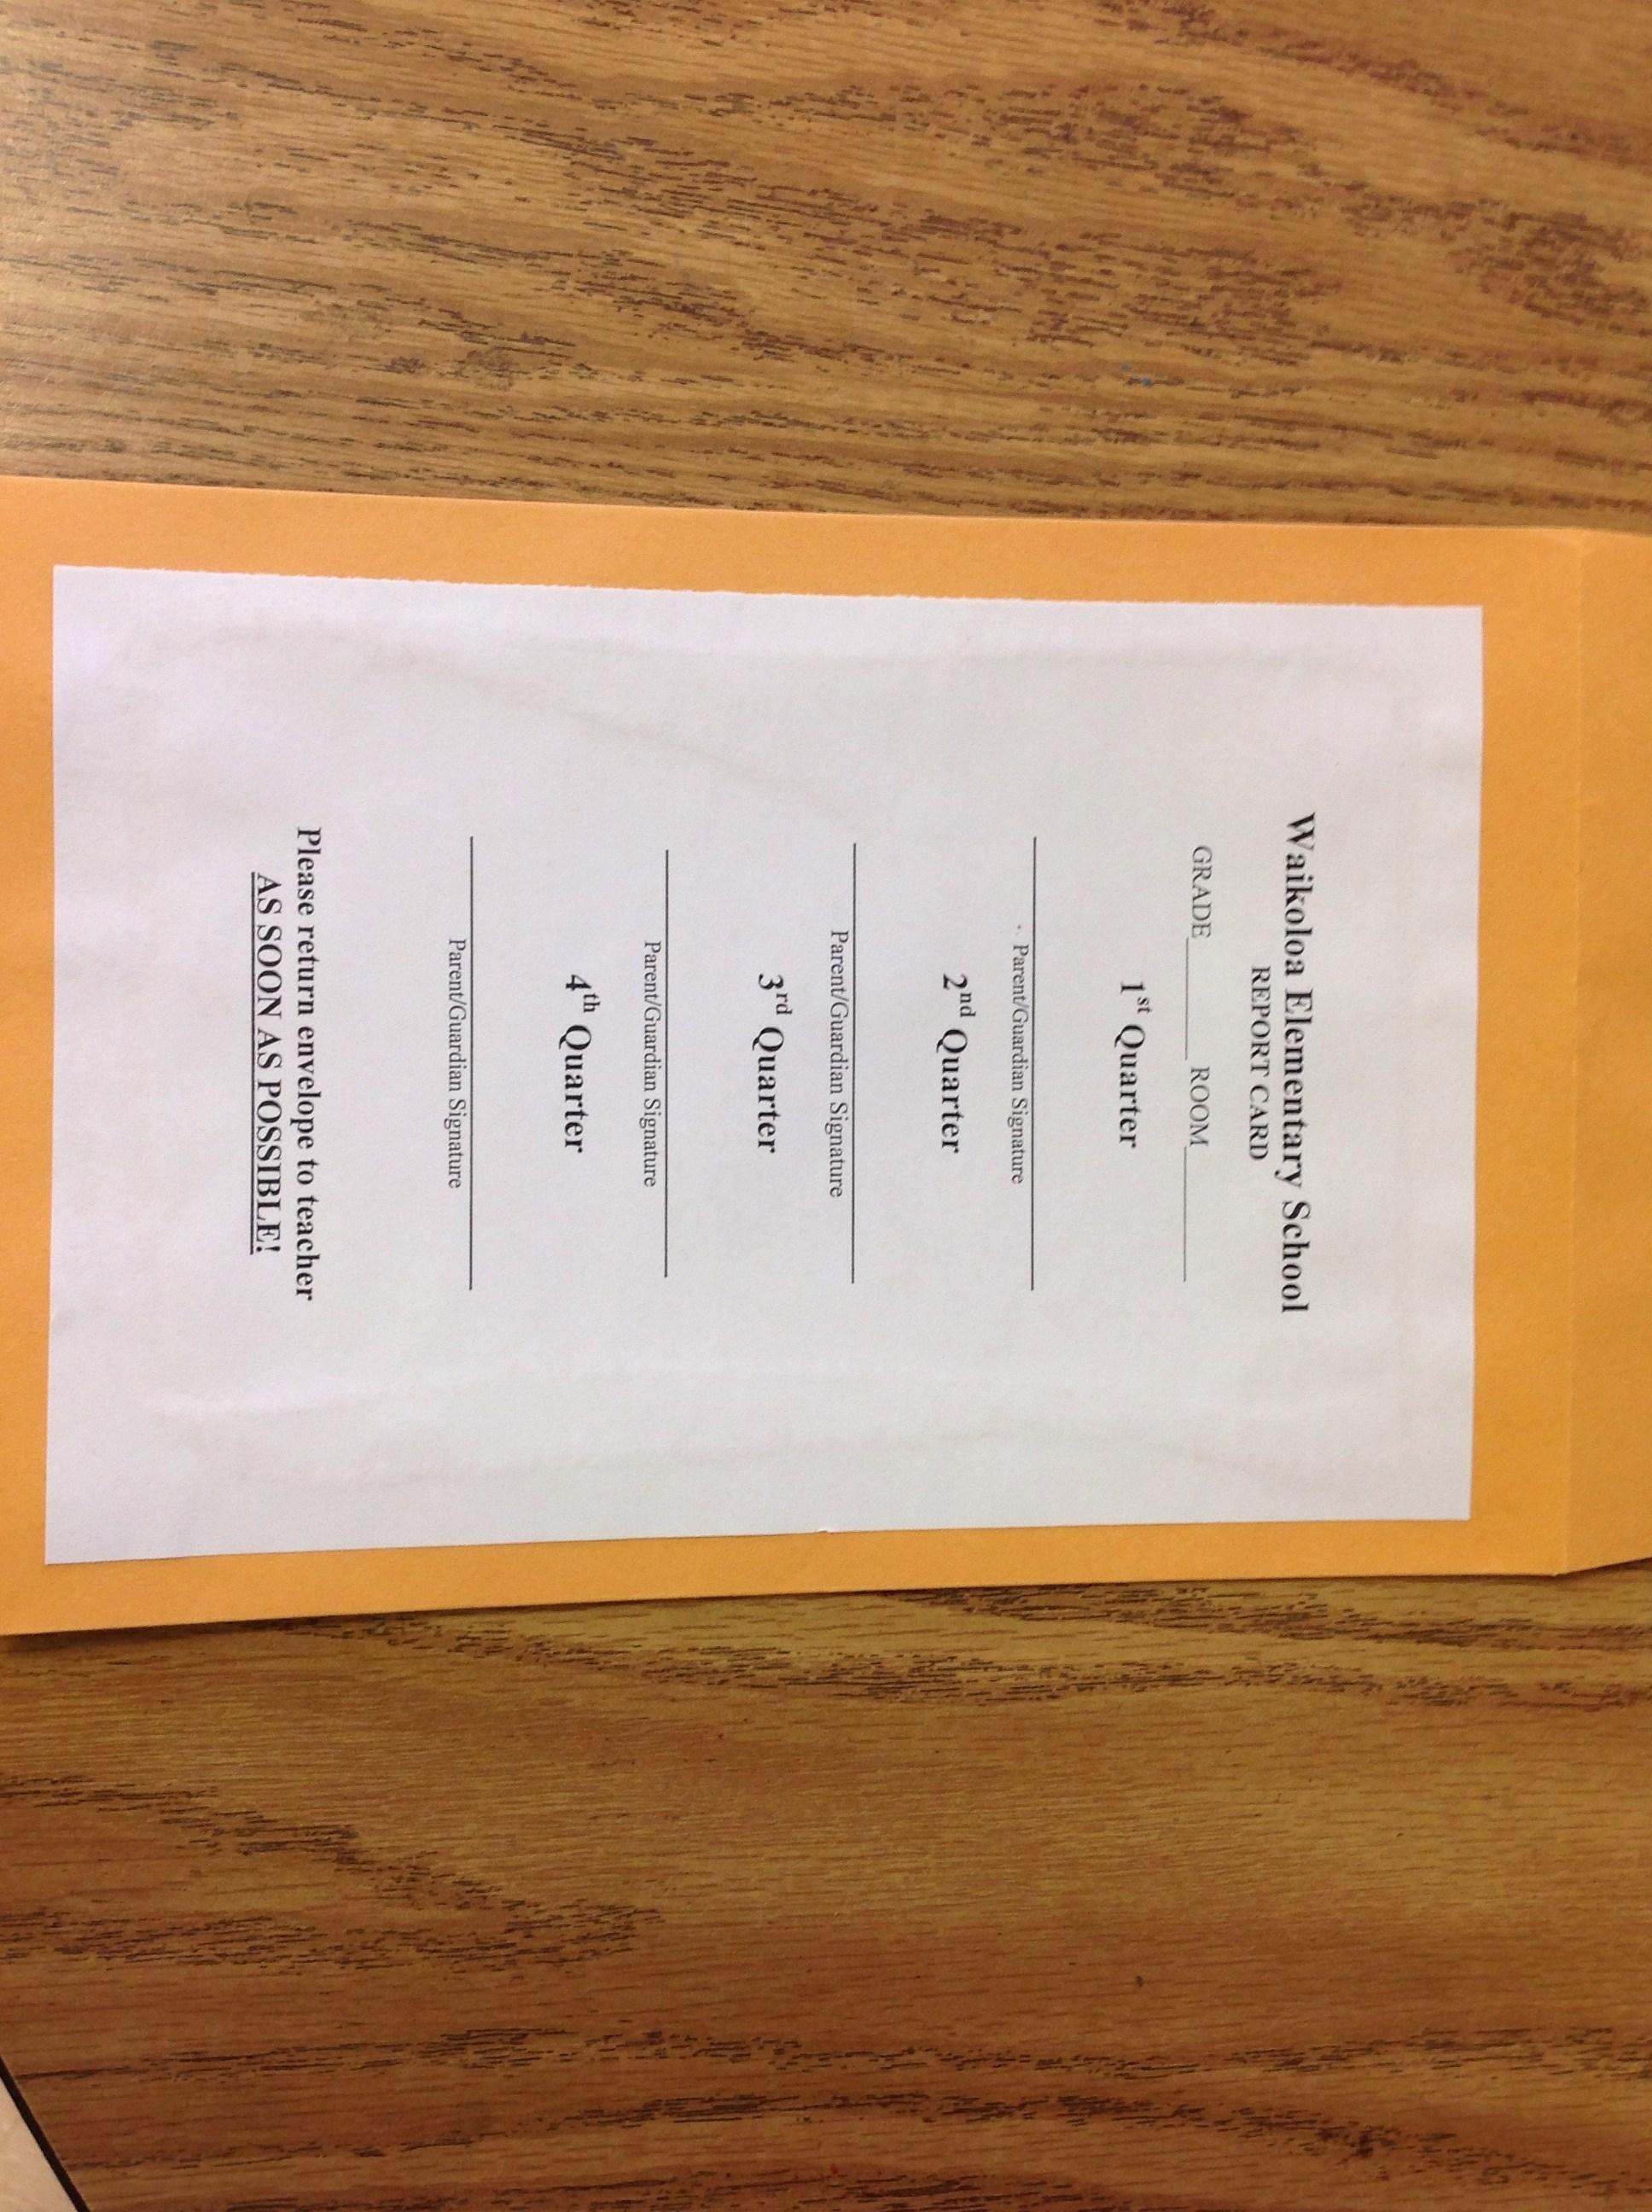 Posts – Blackburn, Ben – Waikoloa Elementary & Middle School